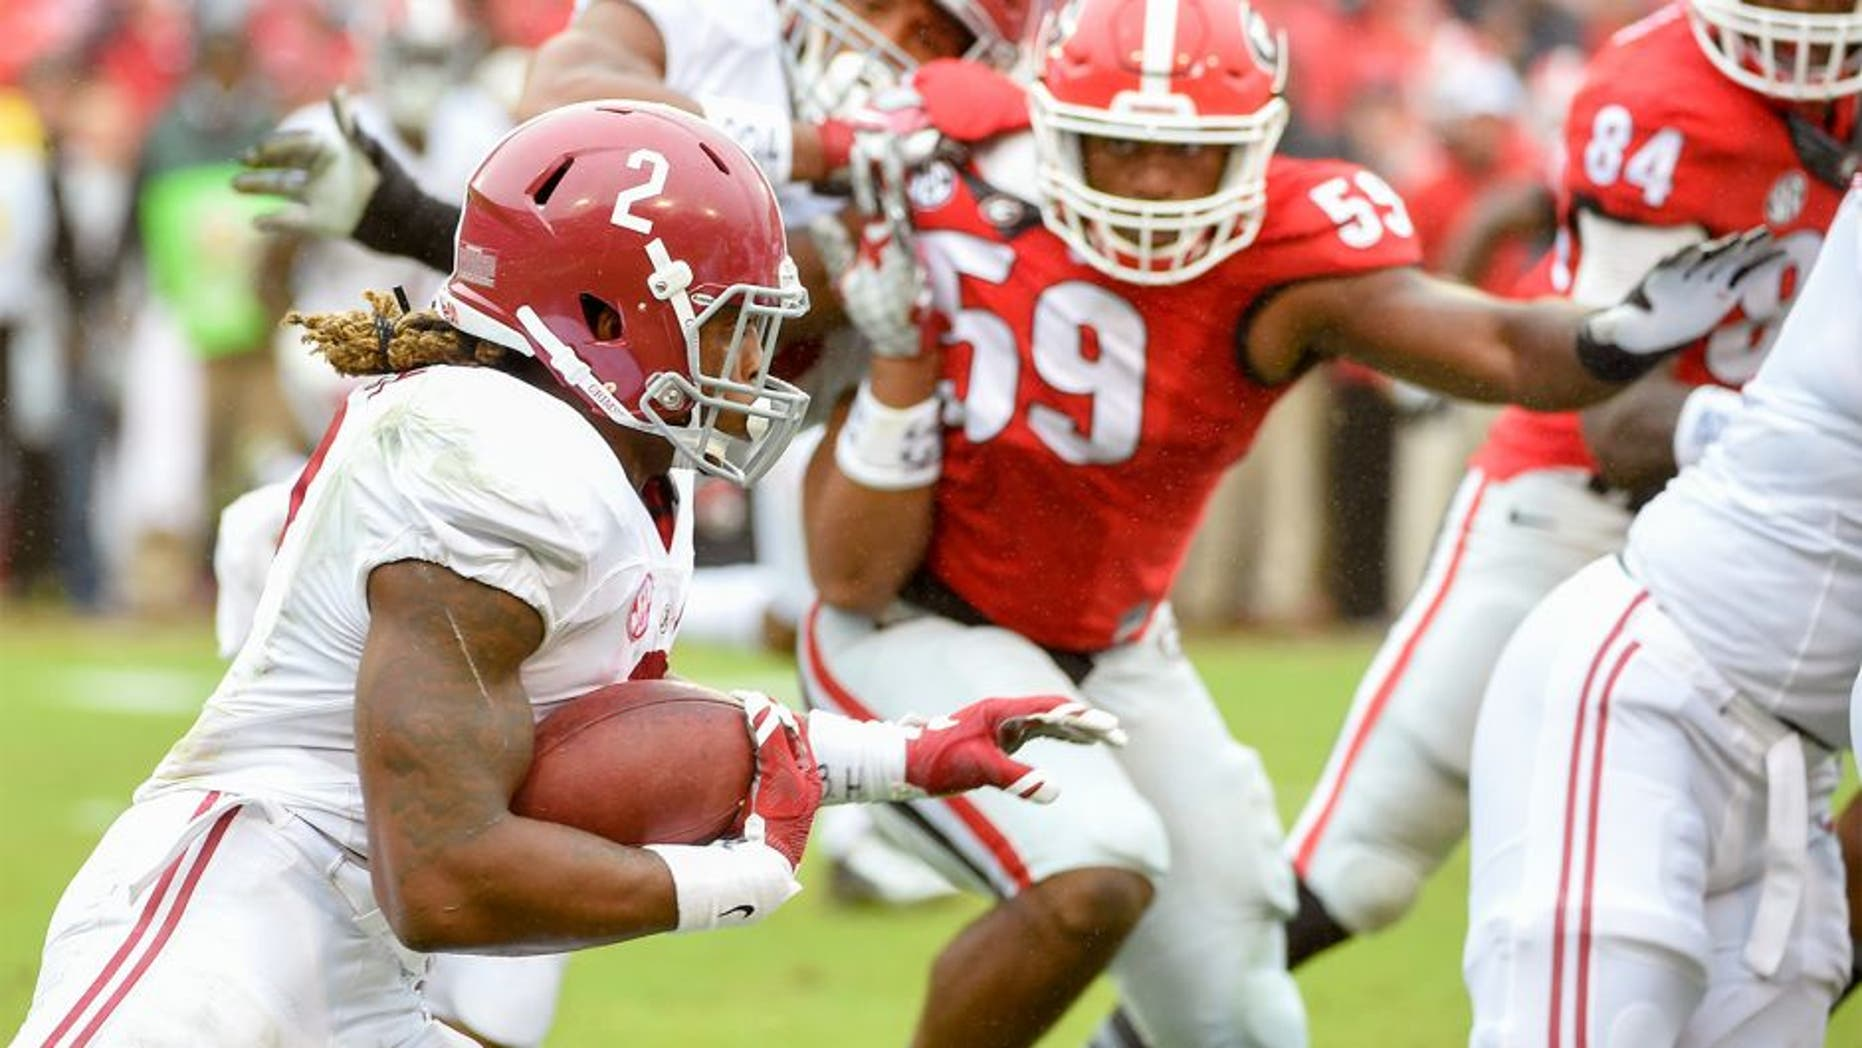 Oct 3, 2015; Athens, GA, USA; Alabama Crimson Tide running back Derrick Henry (2) runs the ball during the first quarter Georgia Bulldogs at Sanford Stadium. Mandatory Credit: John David Mercer-USA TODAY Sports